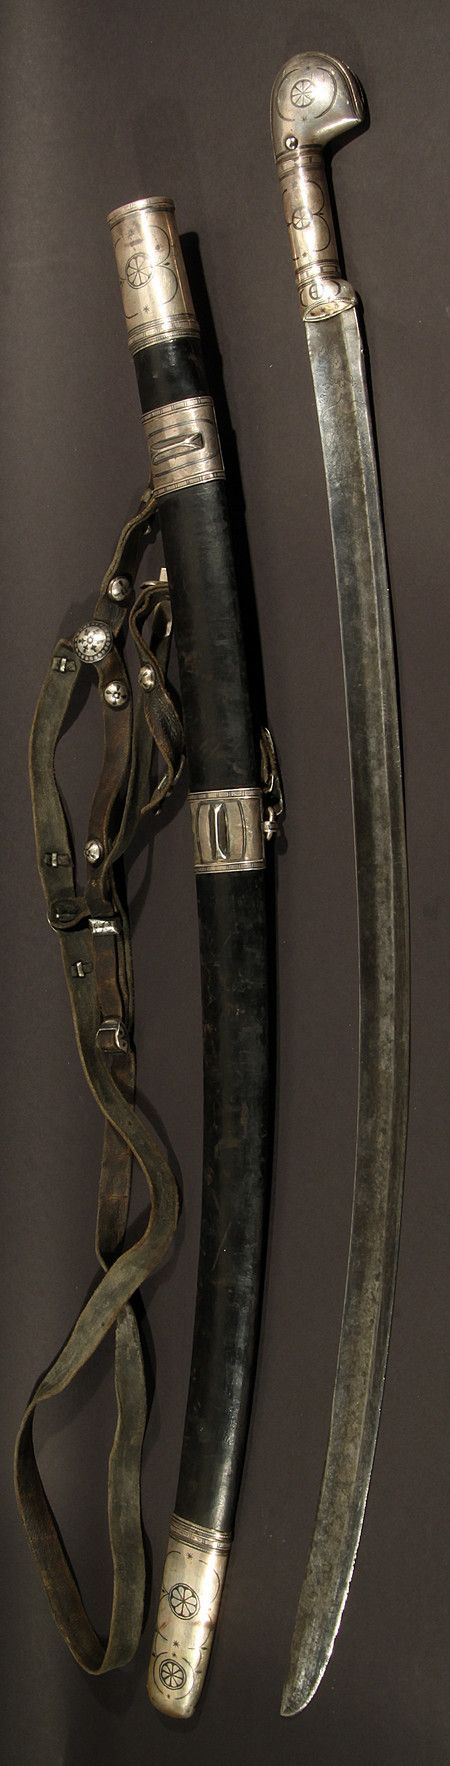 Кавказка шашка / A CAUCASIAN SHASHKA SWORD, LATE 19TH-EARLY 20TH CENTURY